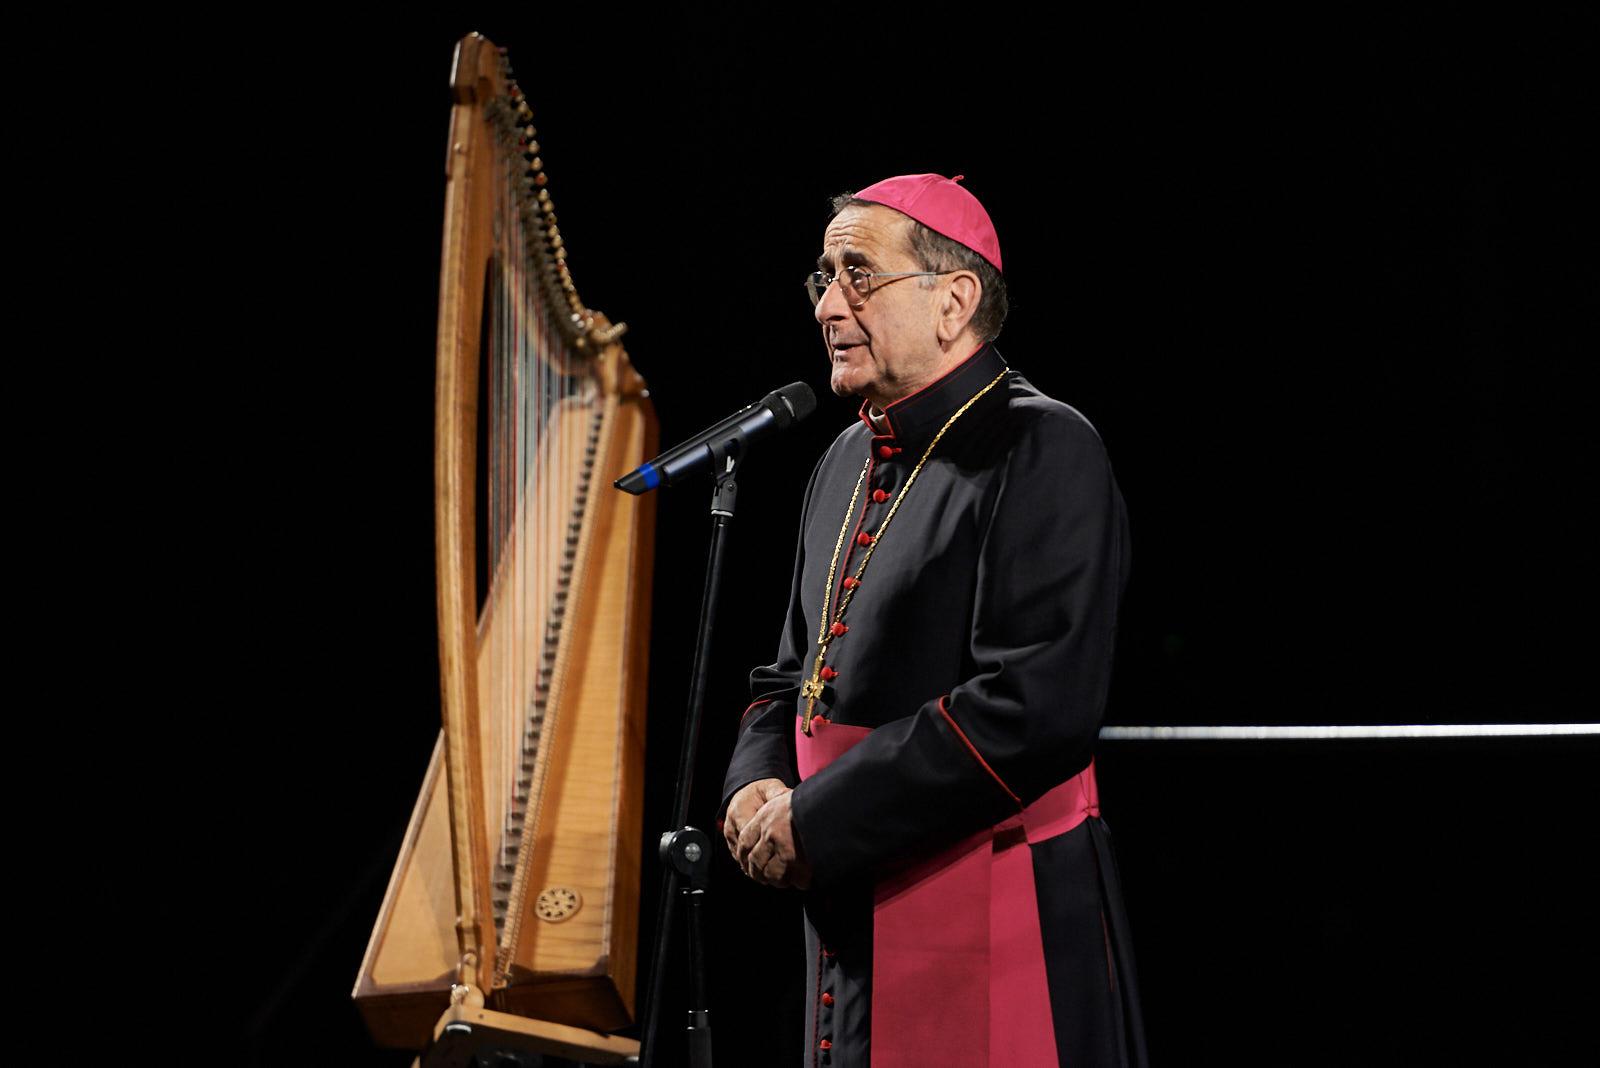 S.E.R. Mons. Mario Delpini, Archbishop of Milan